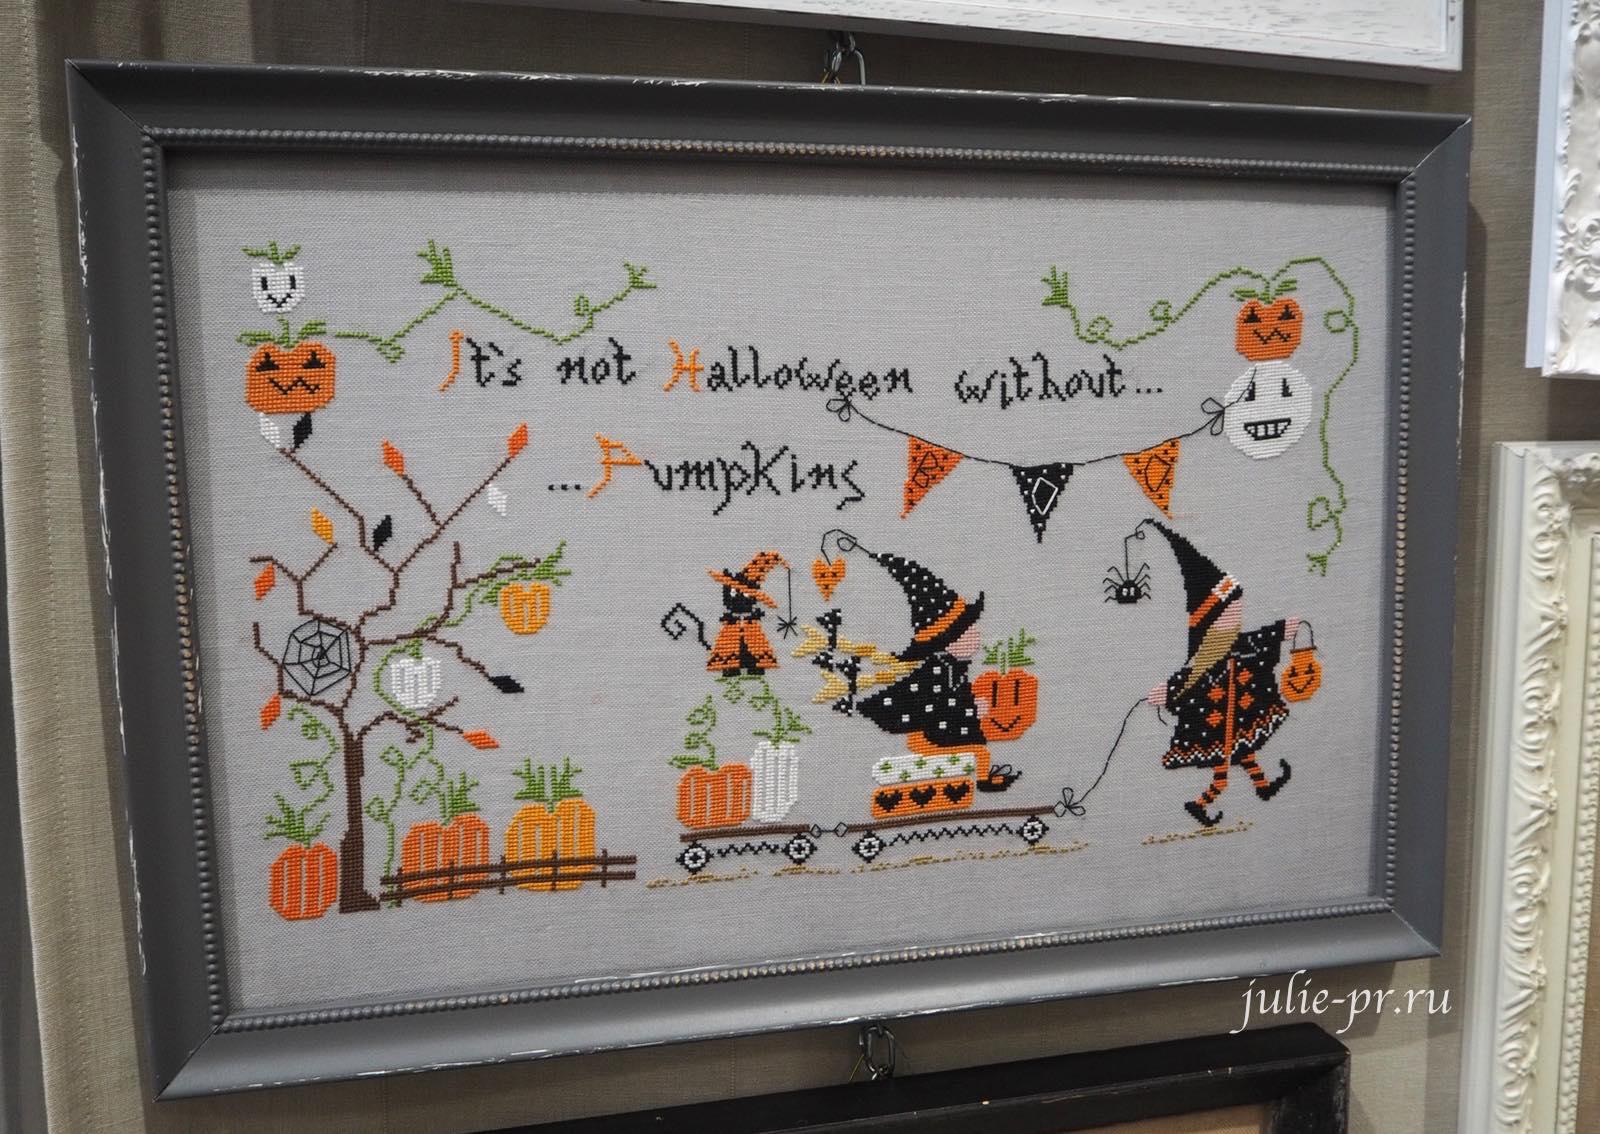 Cuore e batticuore, Non e Halloween senza Zucche, Нет хэллоуина без тыкв, вышивка крестом